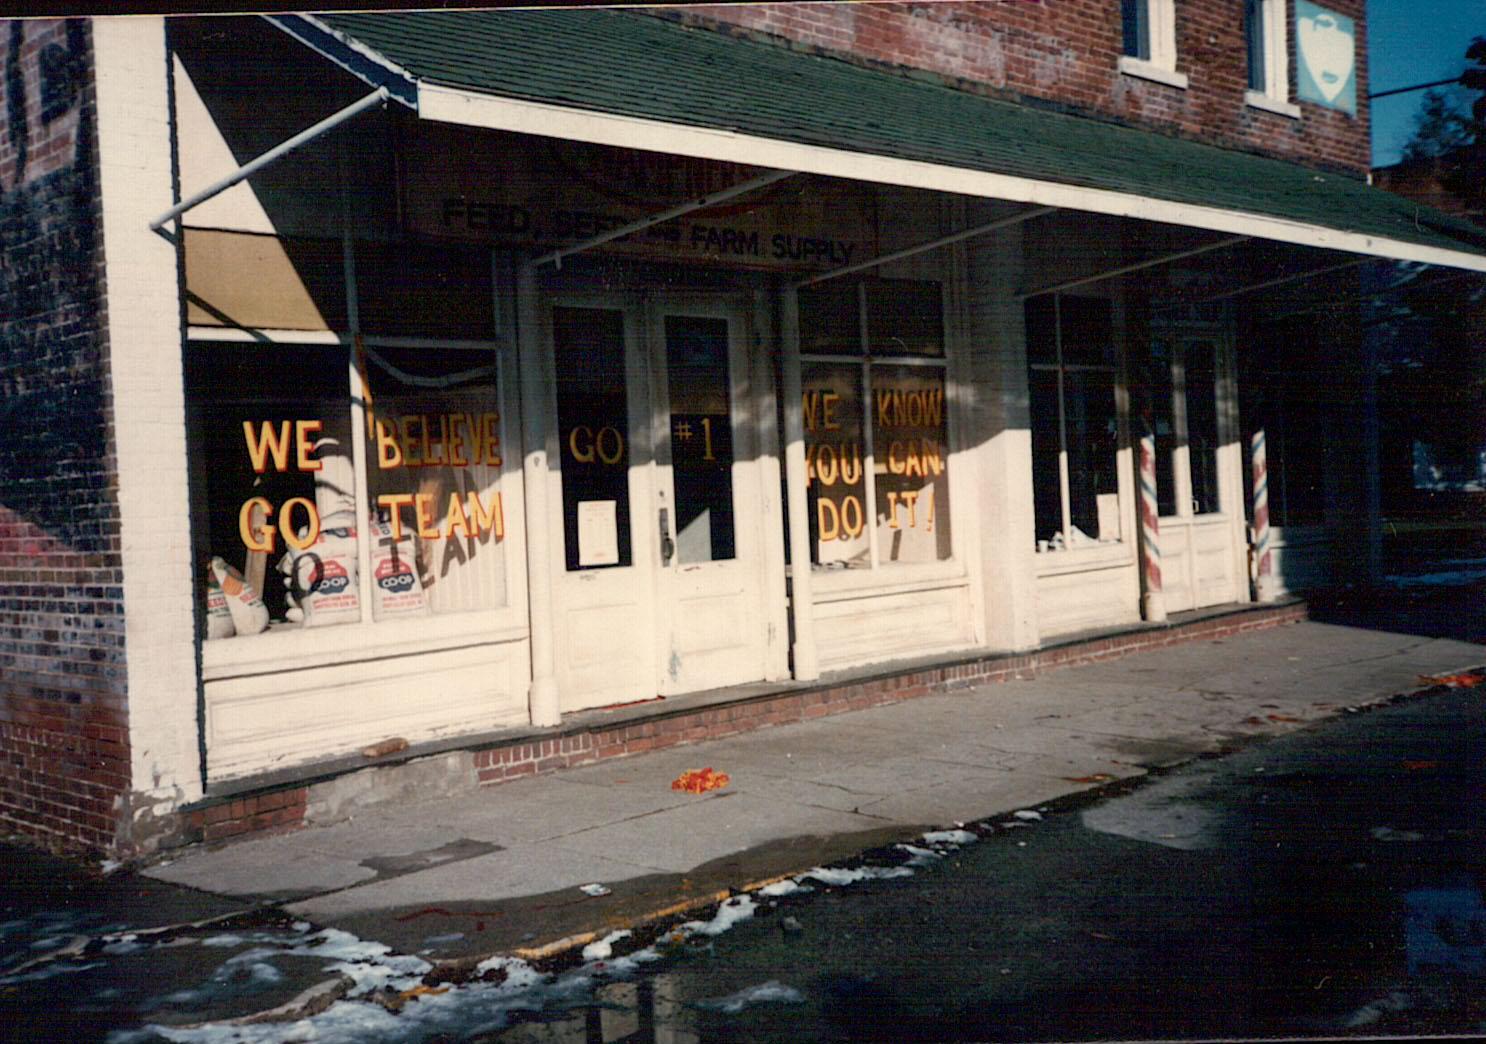 Crew members painted store windows in preparation for the caravan scene, filmed December 3, 1985. It had snowed overnight.